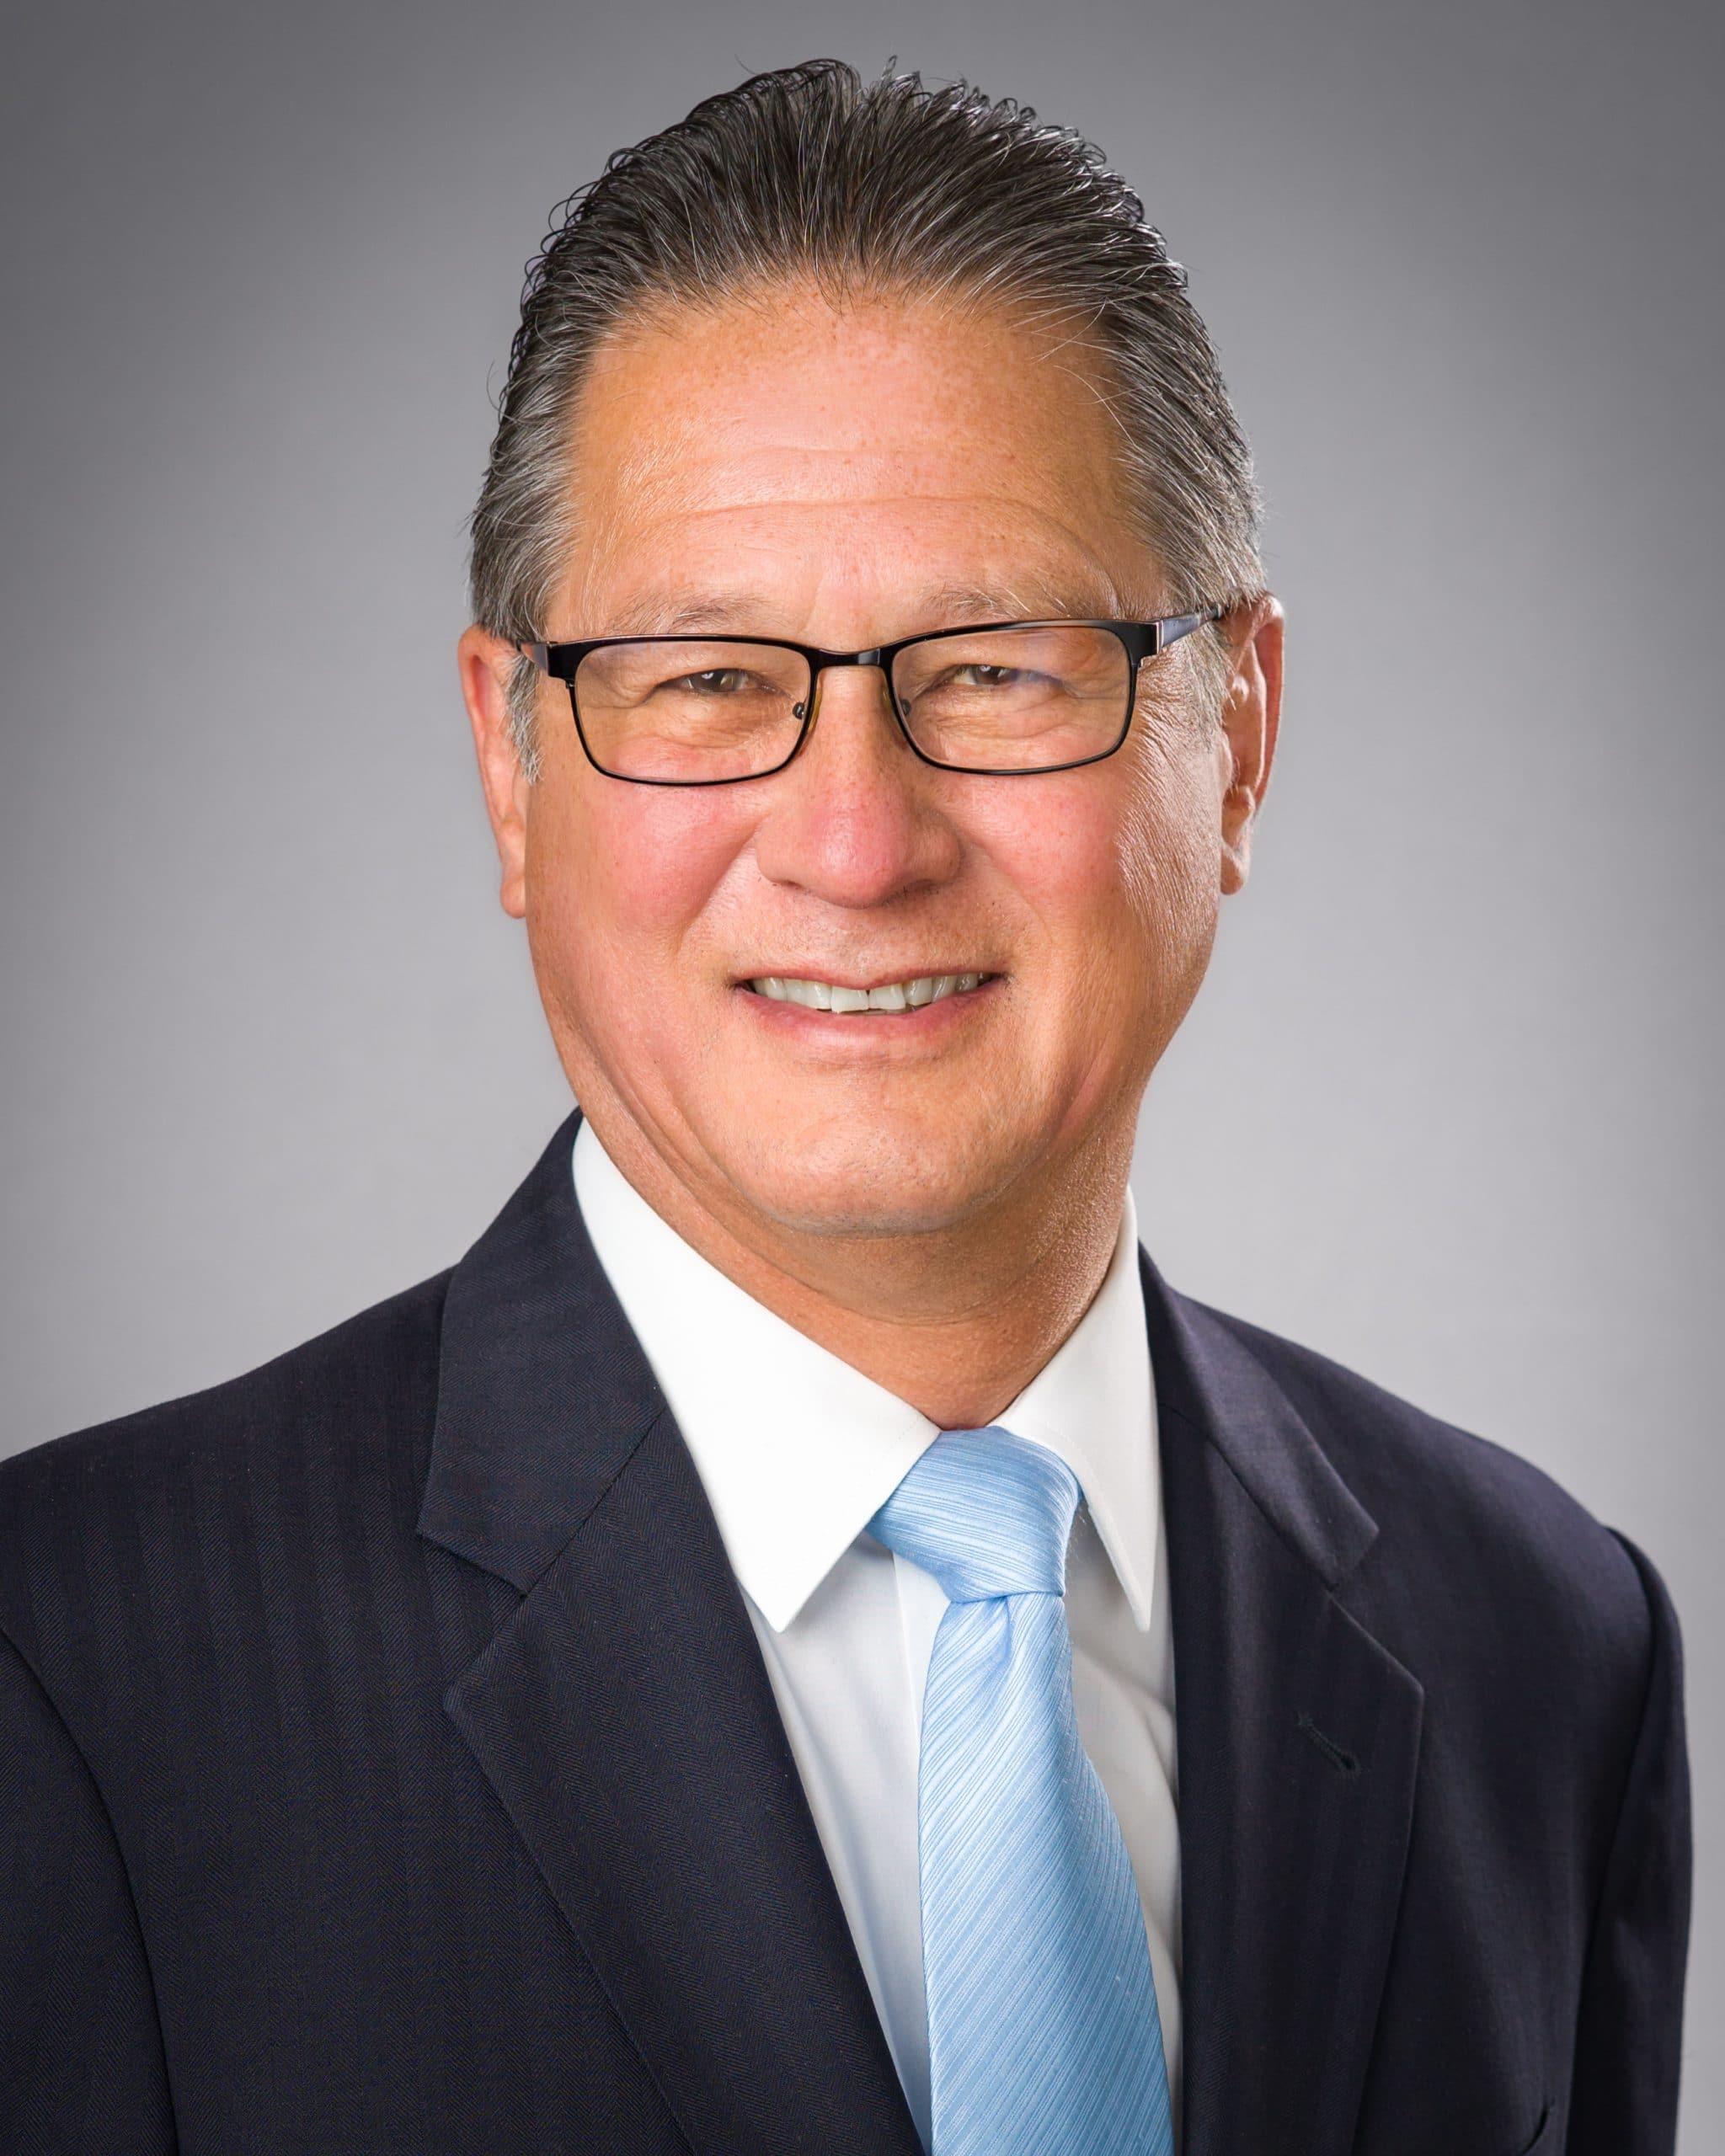 John W. Simek, Vice President at Sensei Enterprises, Inc.